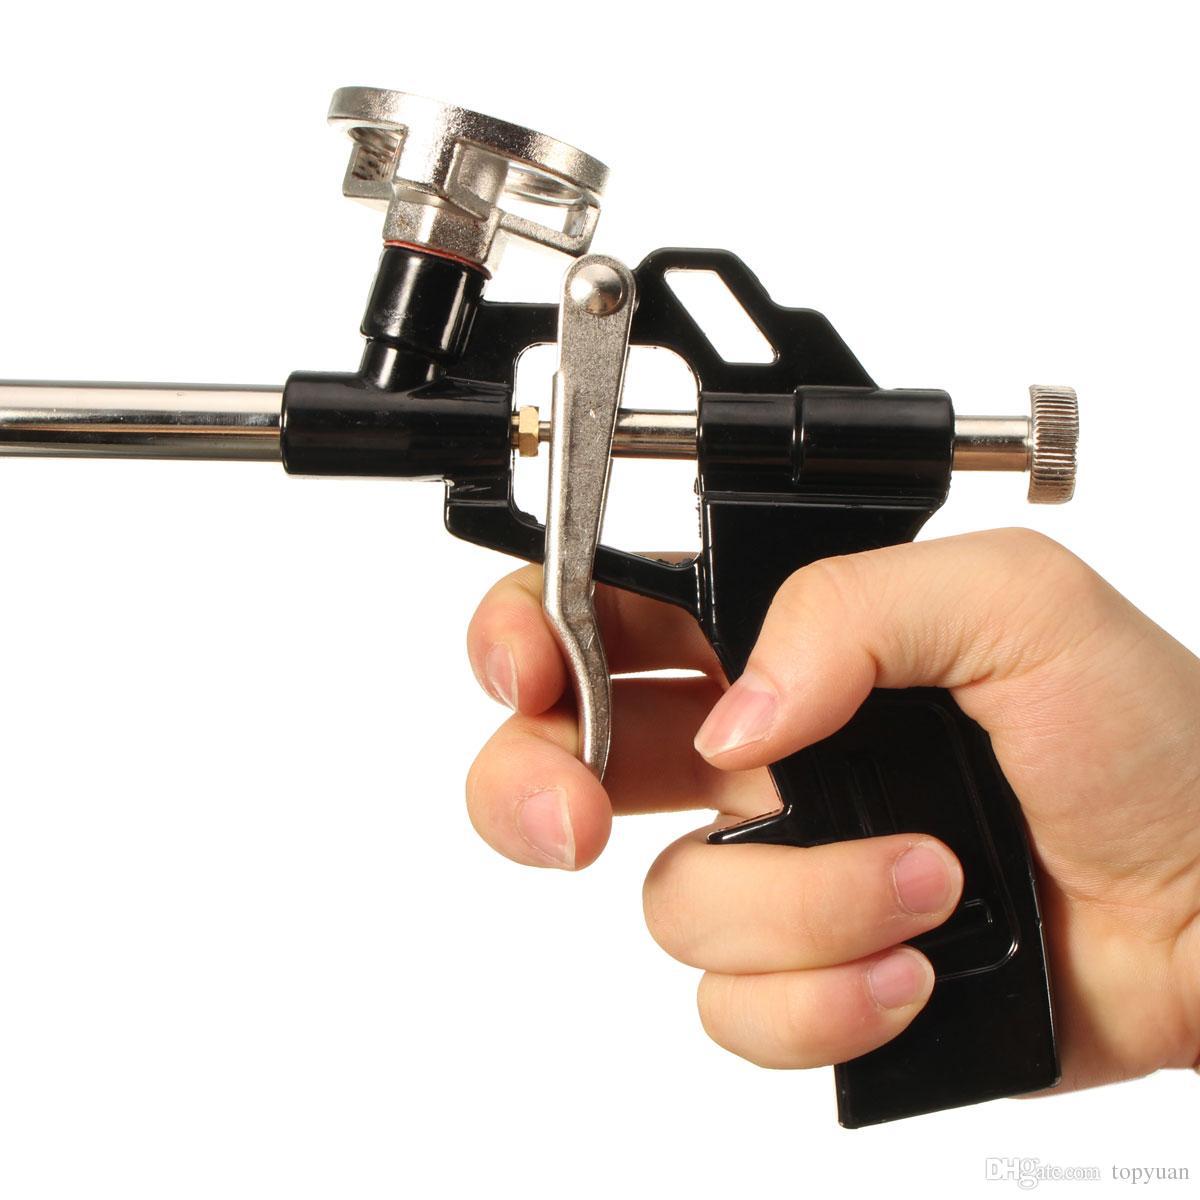 BL-119 Pro Heavy Duty PU Schaum Gun Grade Expandierende Spray Anwendung Applikator